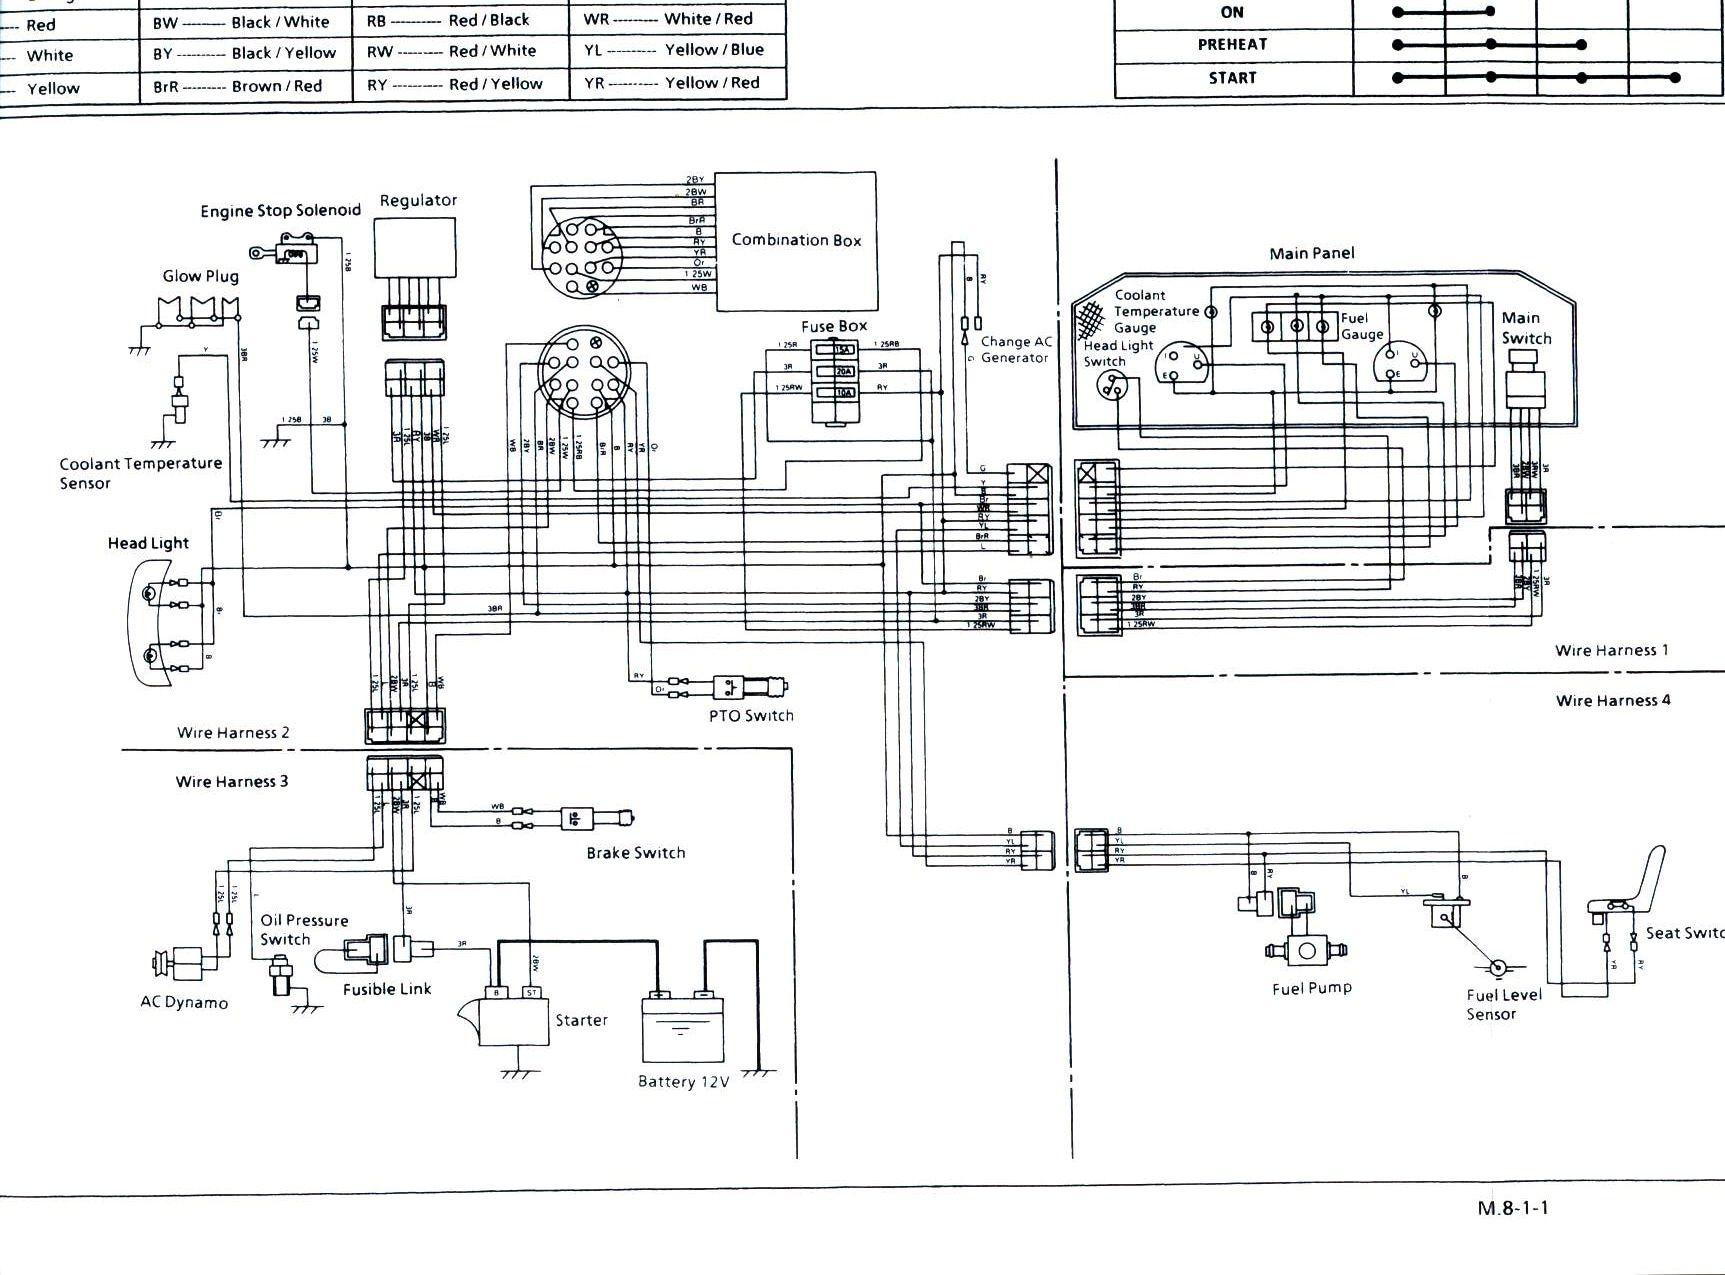 G1800 Elec Jpg 1725 X 1275 54 Diagram Diagram Chart Wire